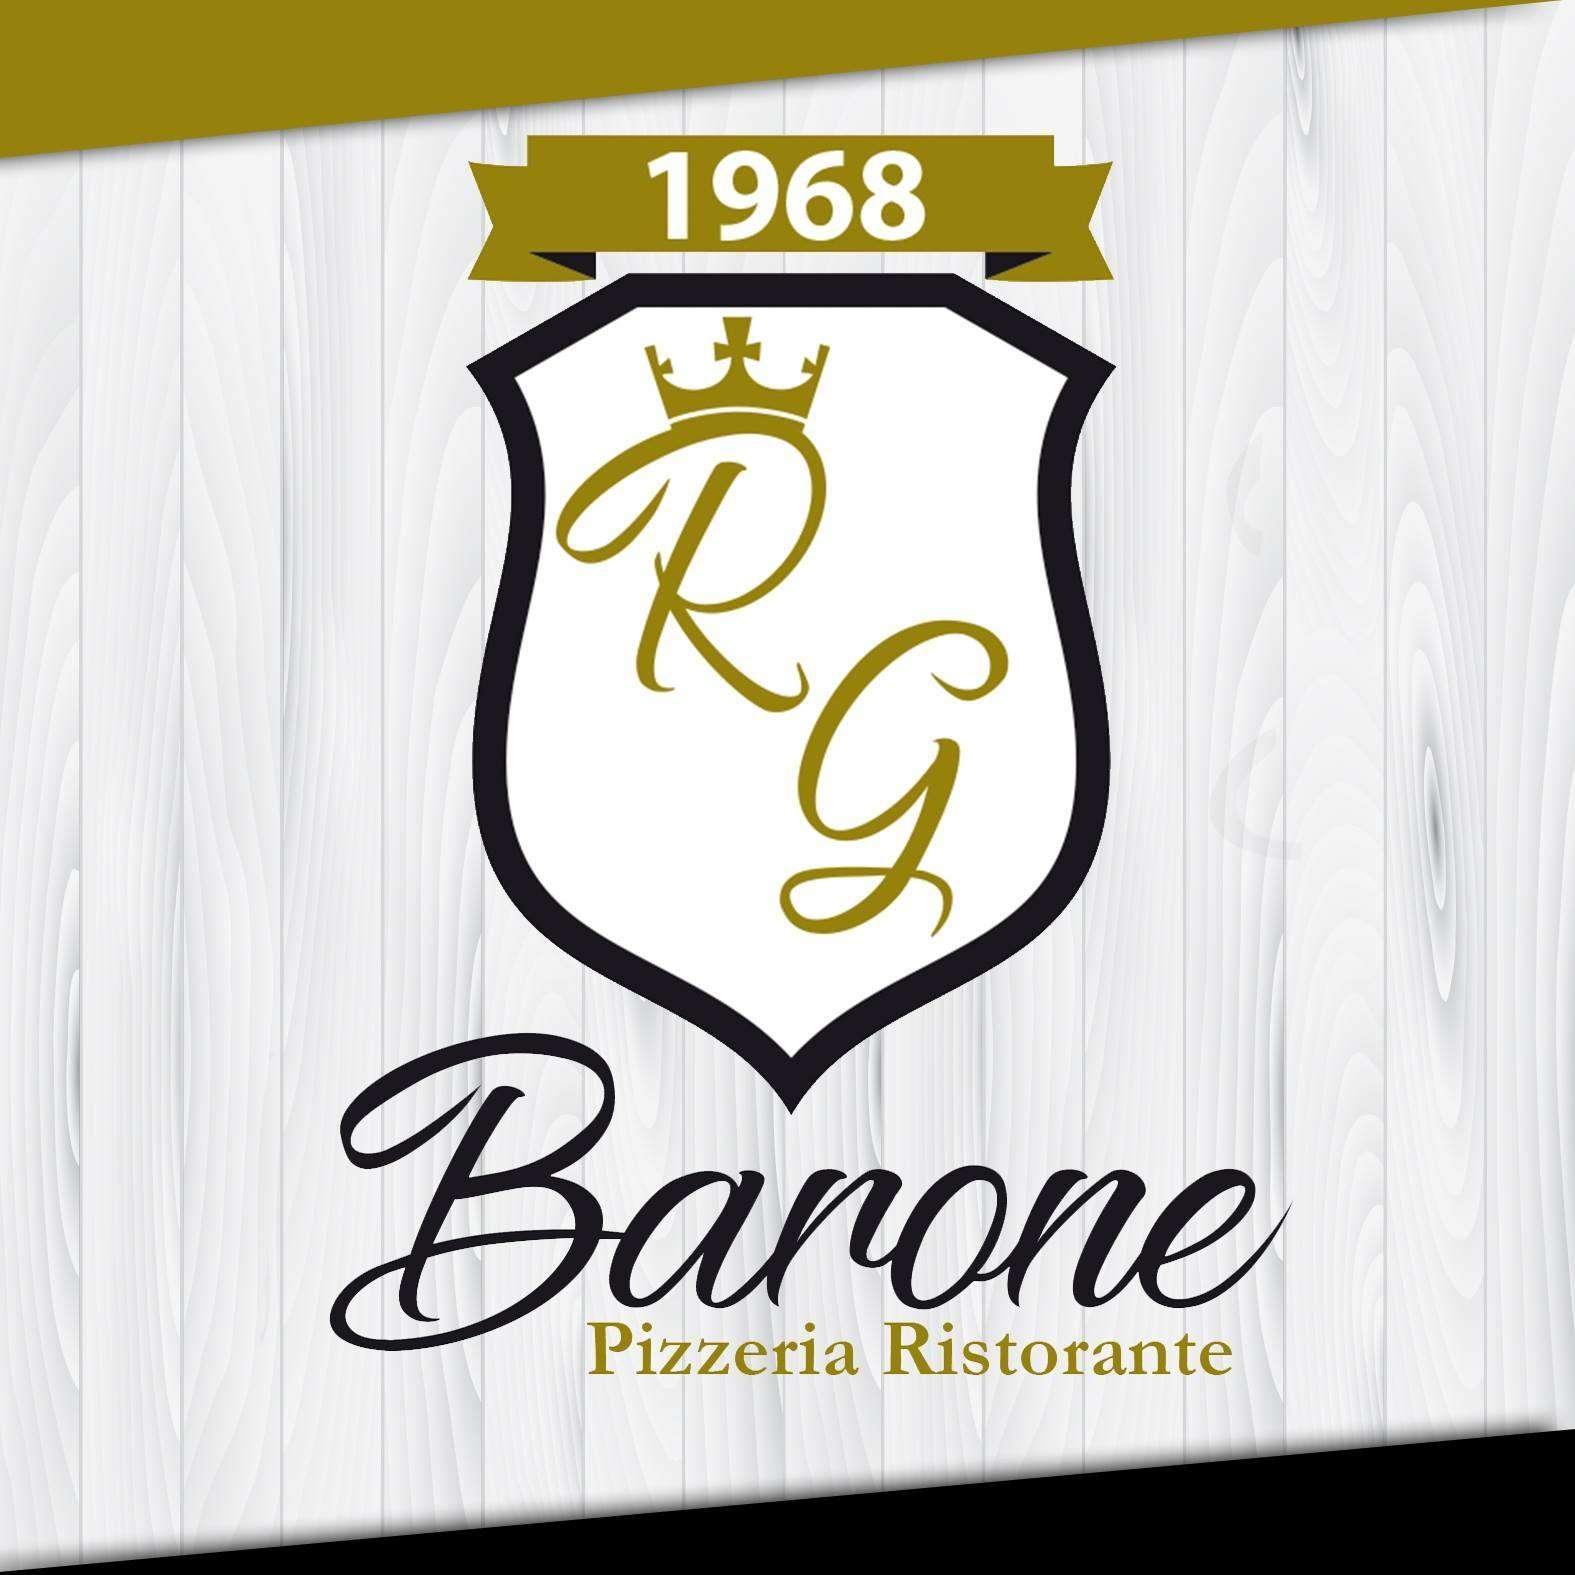 logo RG BARONE